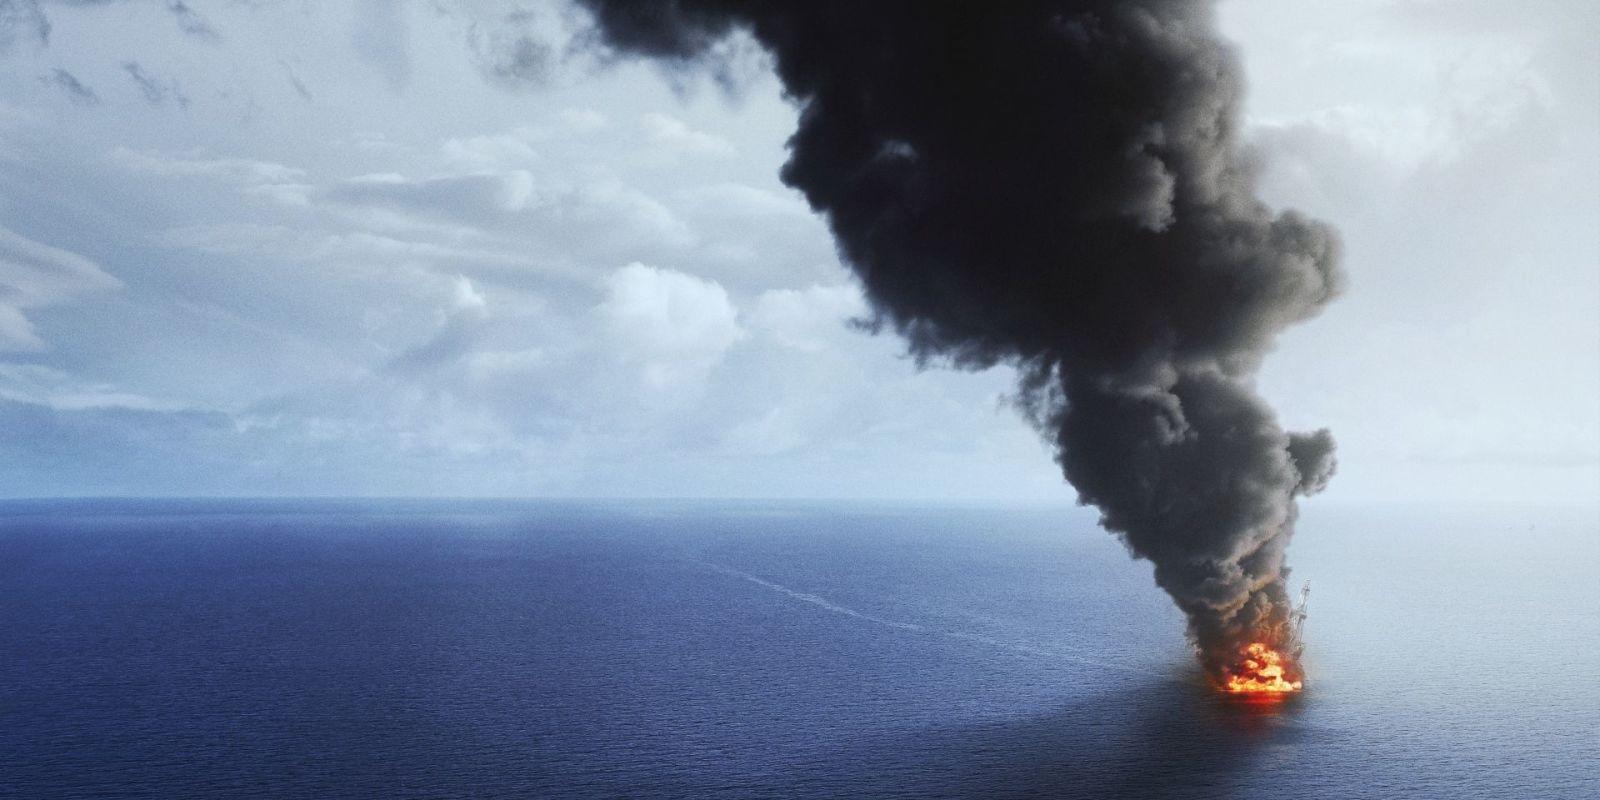 Deepwater Horizon rig: What went wrong?